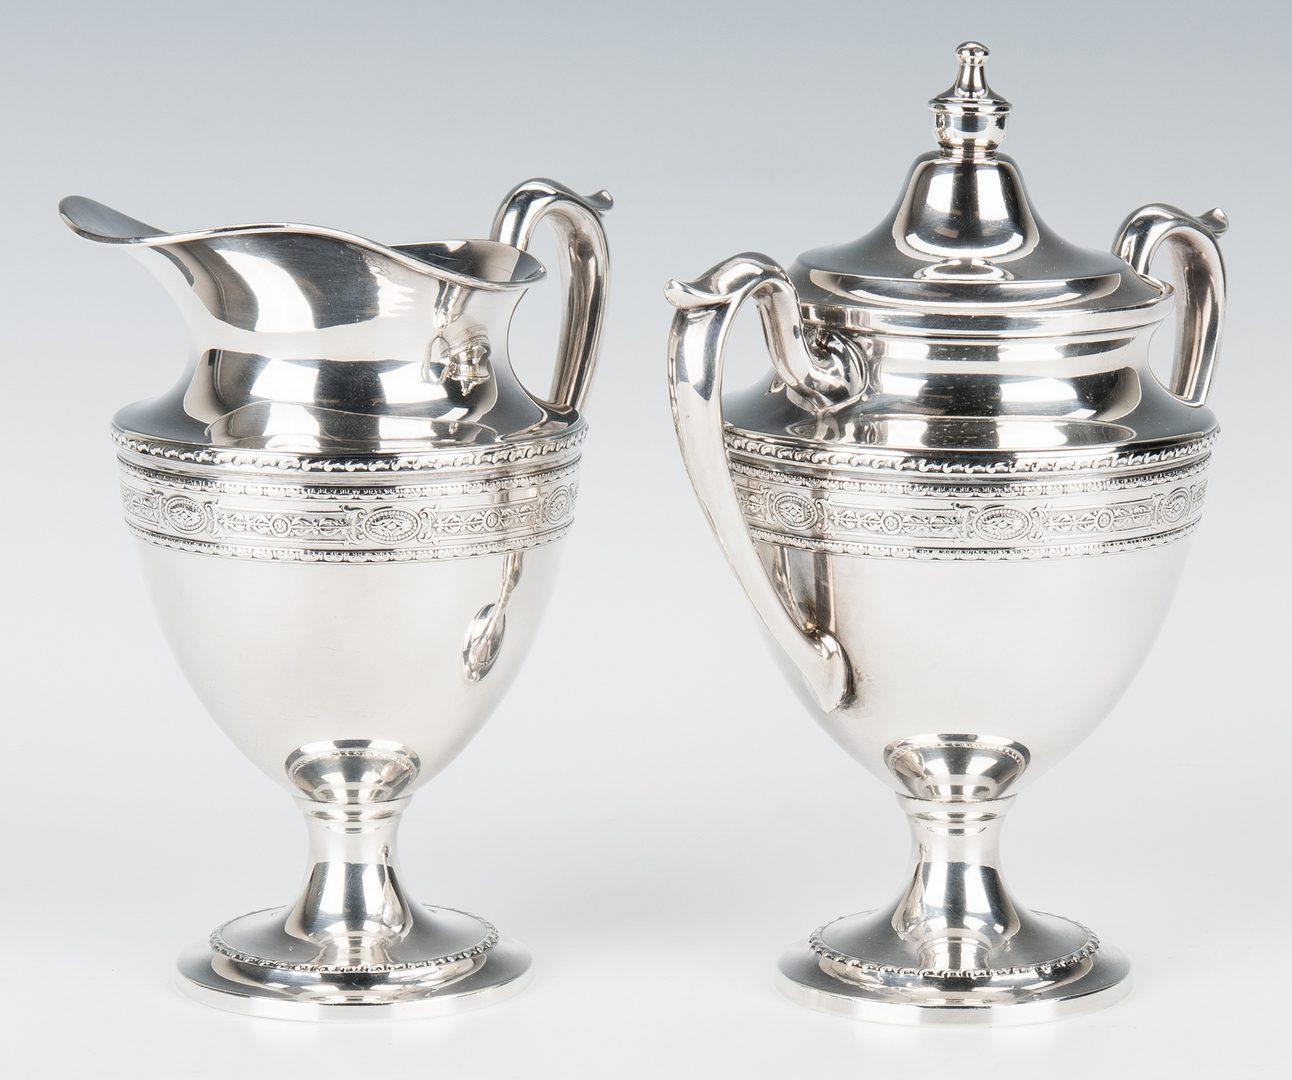 Lot 450: Goodman & Sons 5 pc. Sterling Silver Tea Set